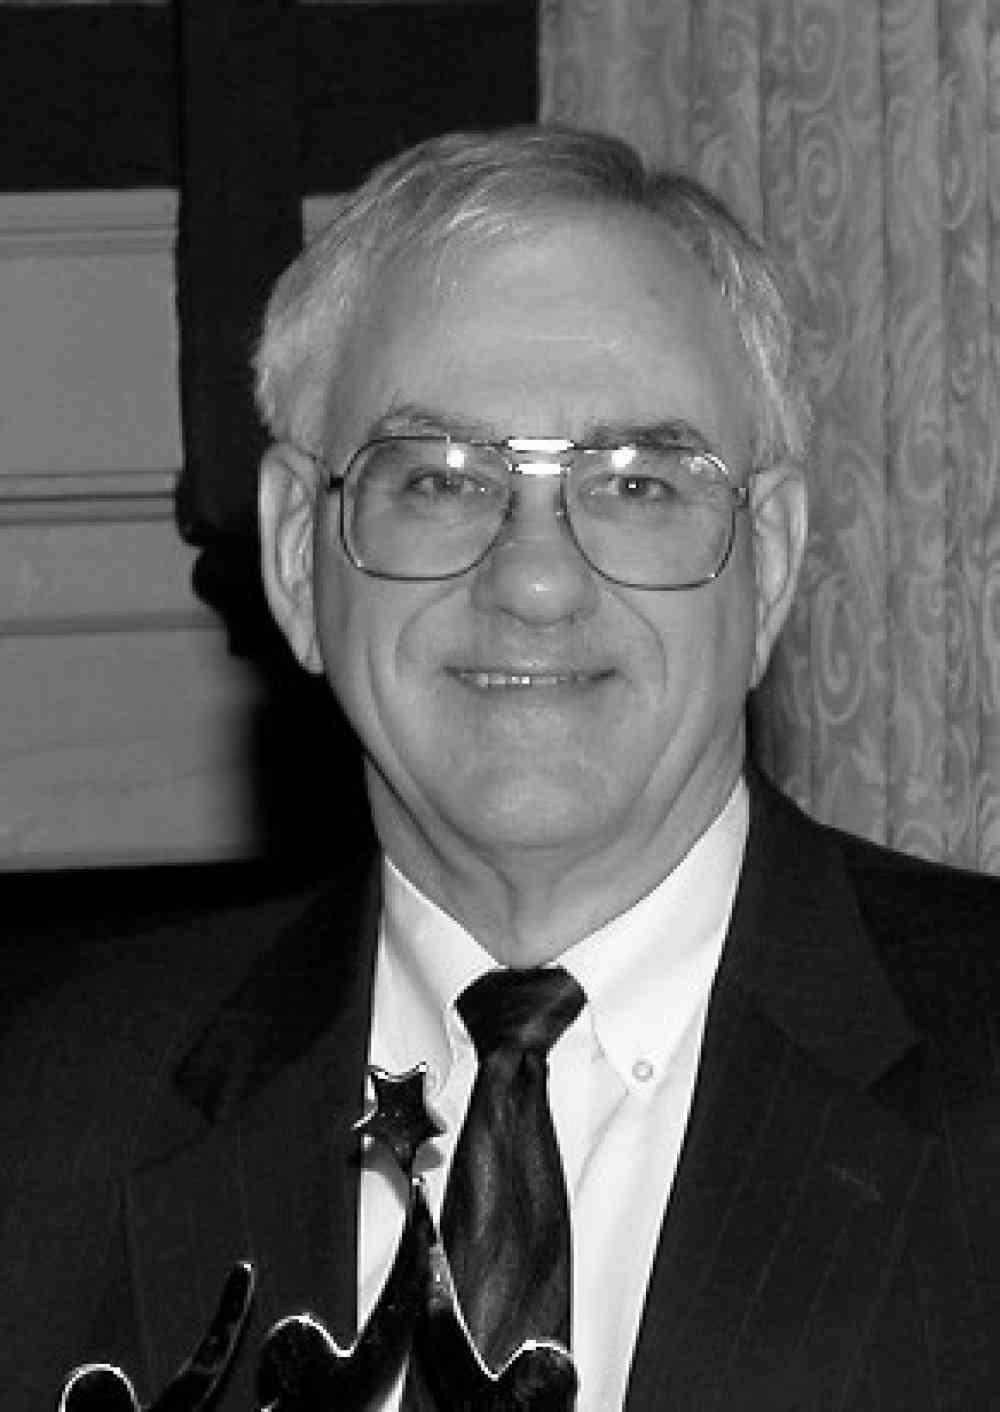 Mike Mc Lanahan